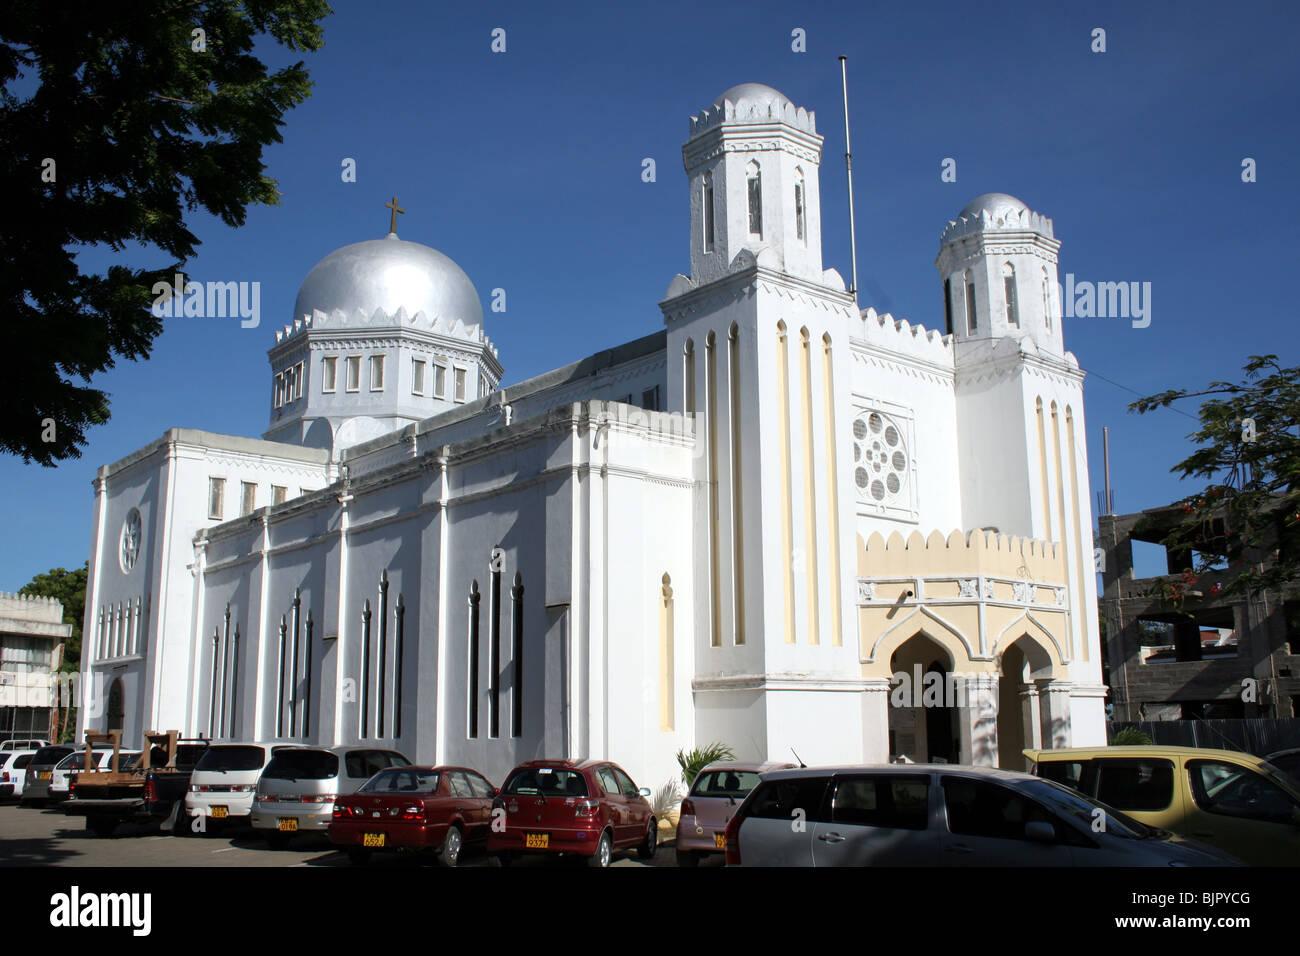 ACK Mombasa Memorial Cathedral - Stock Image